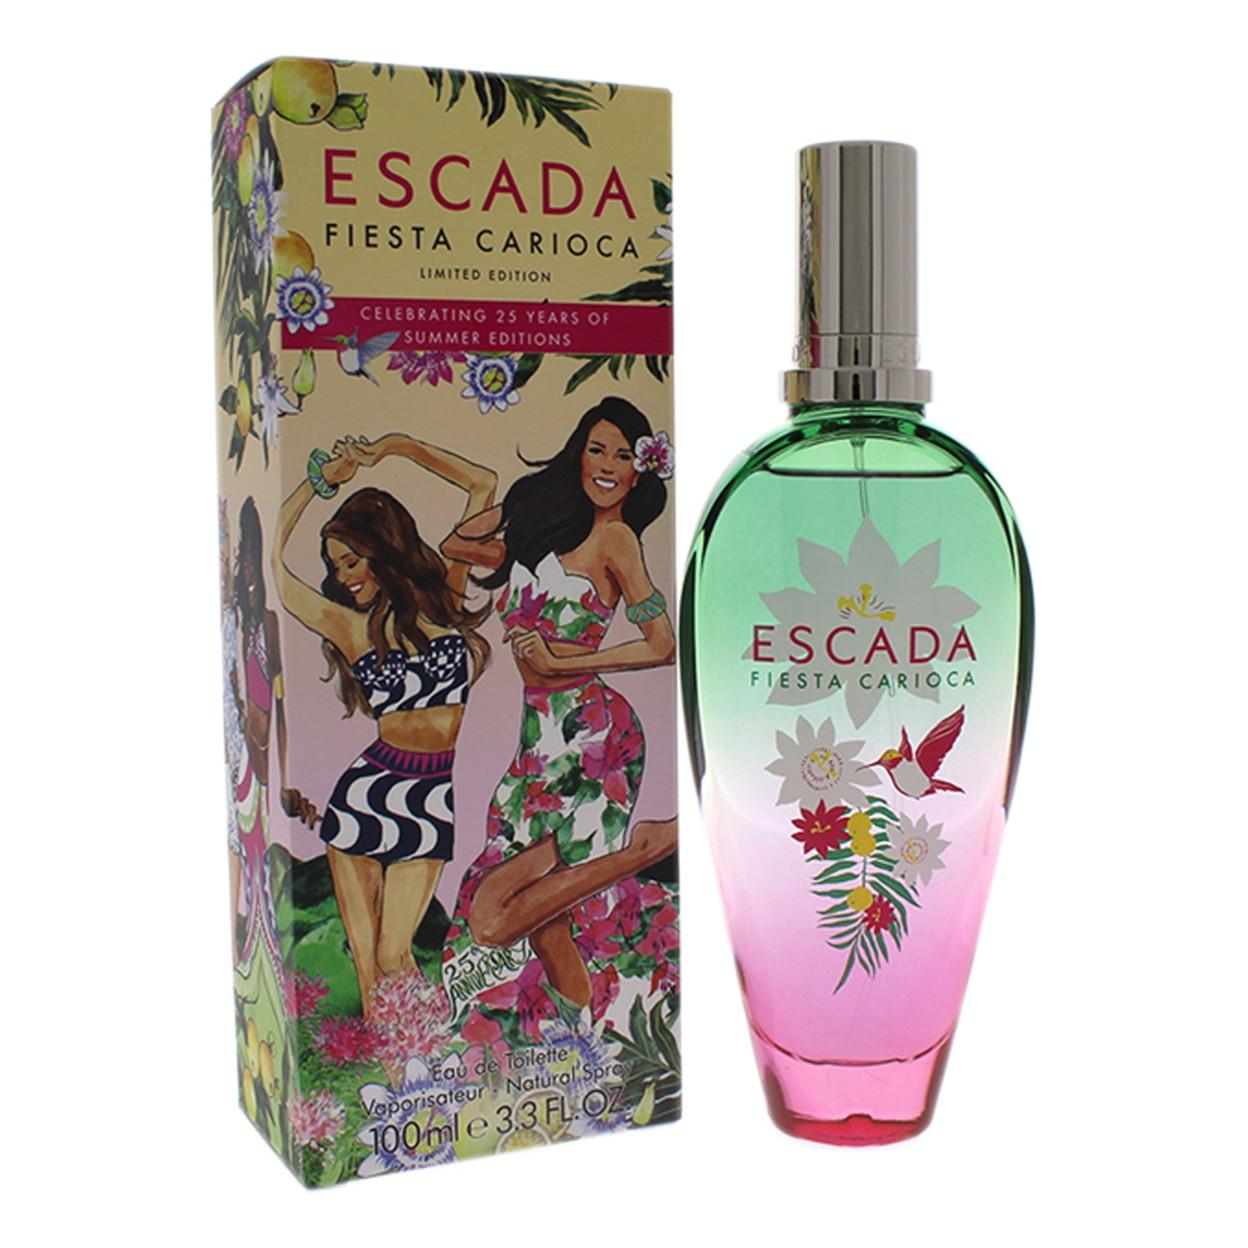 Fiesta Carioca by Escada for Women - 3.3 oz EDT Spray (Limited Edition) escada escada fiesta carioca туалетная вода 50 мл